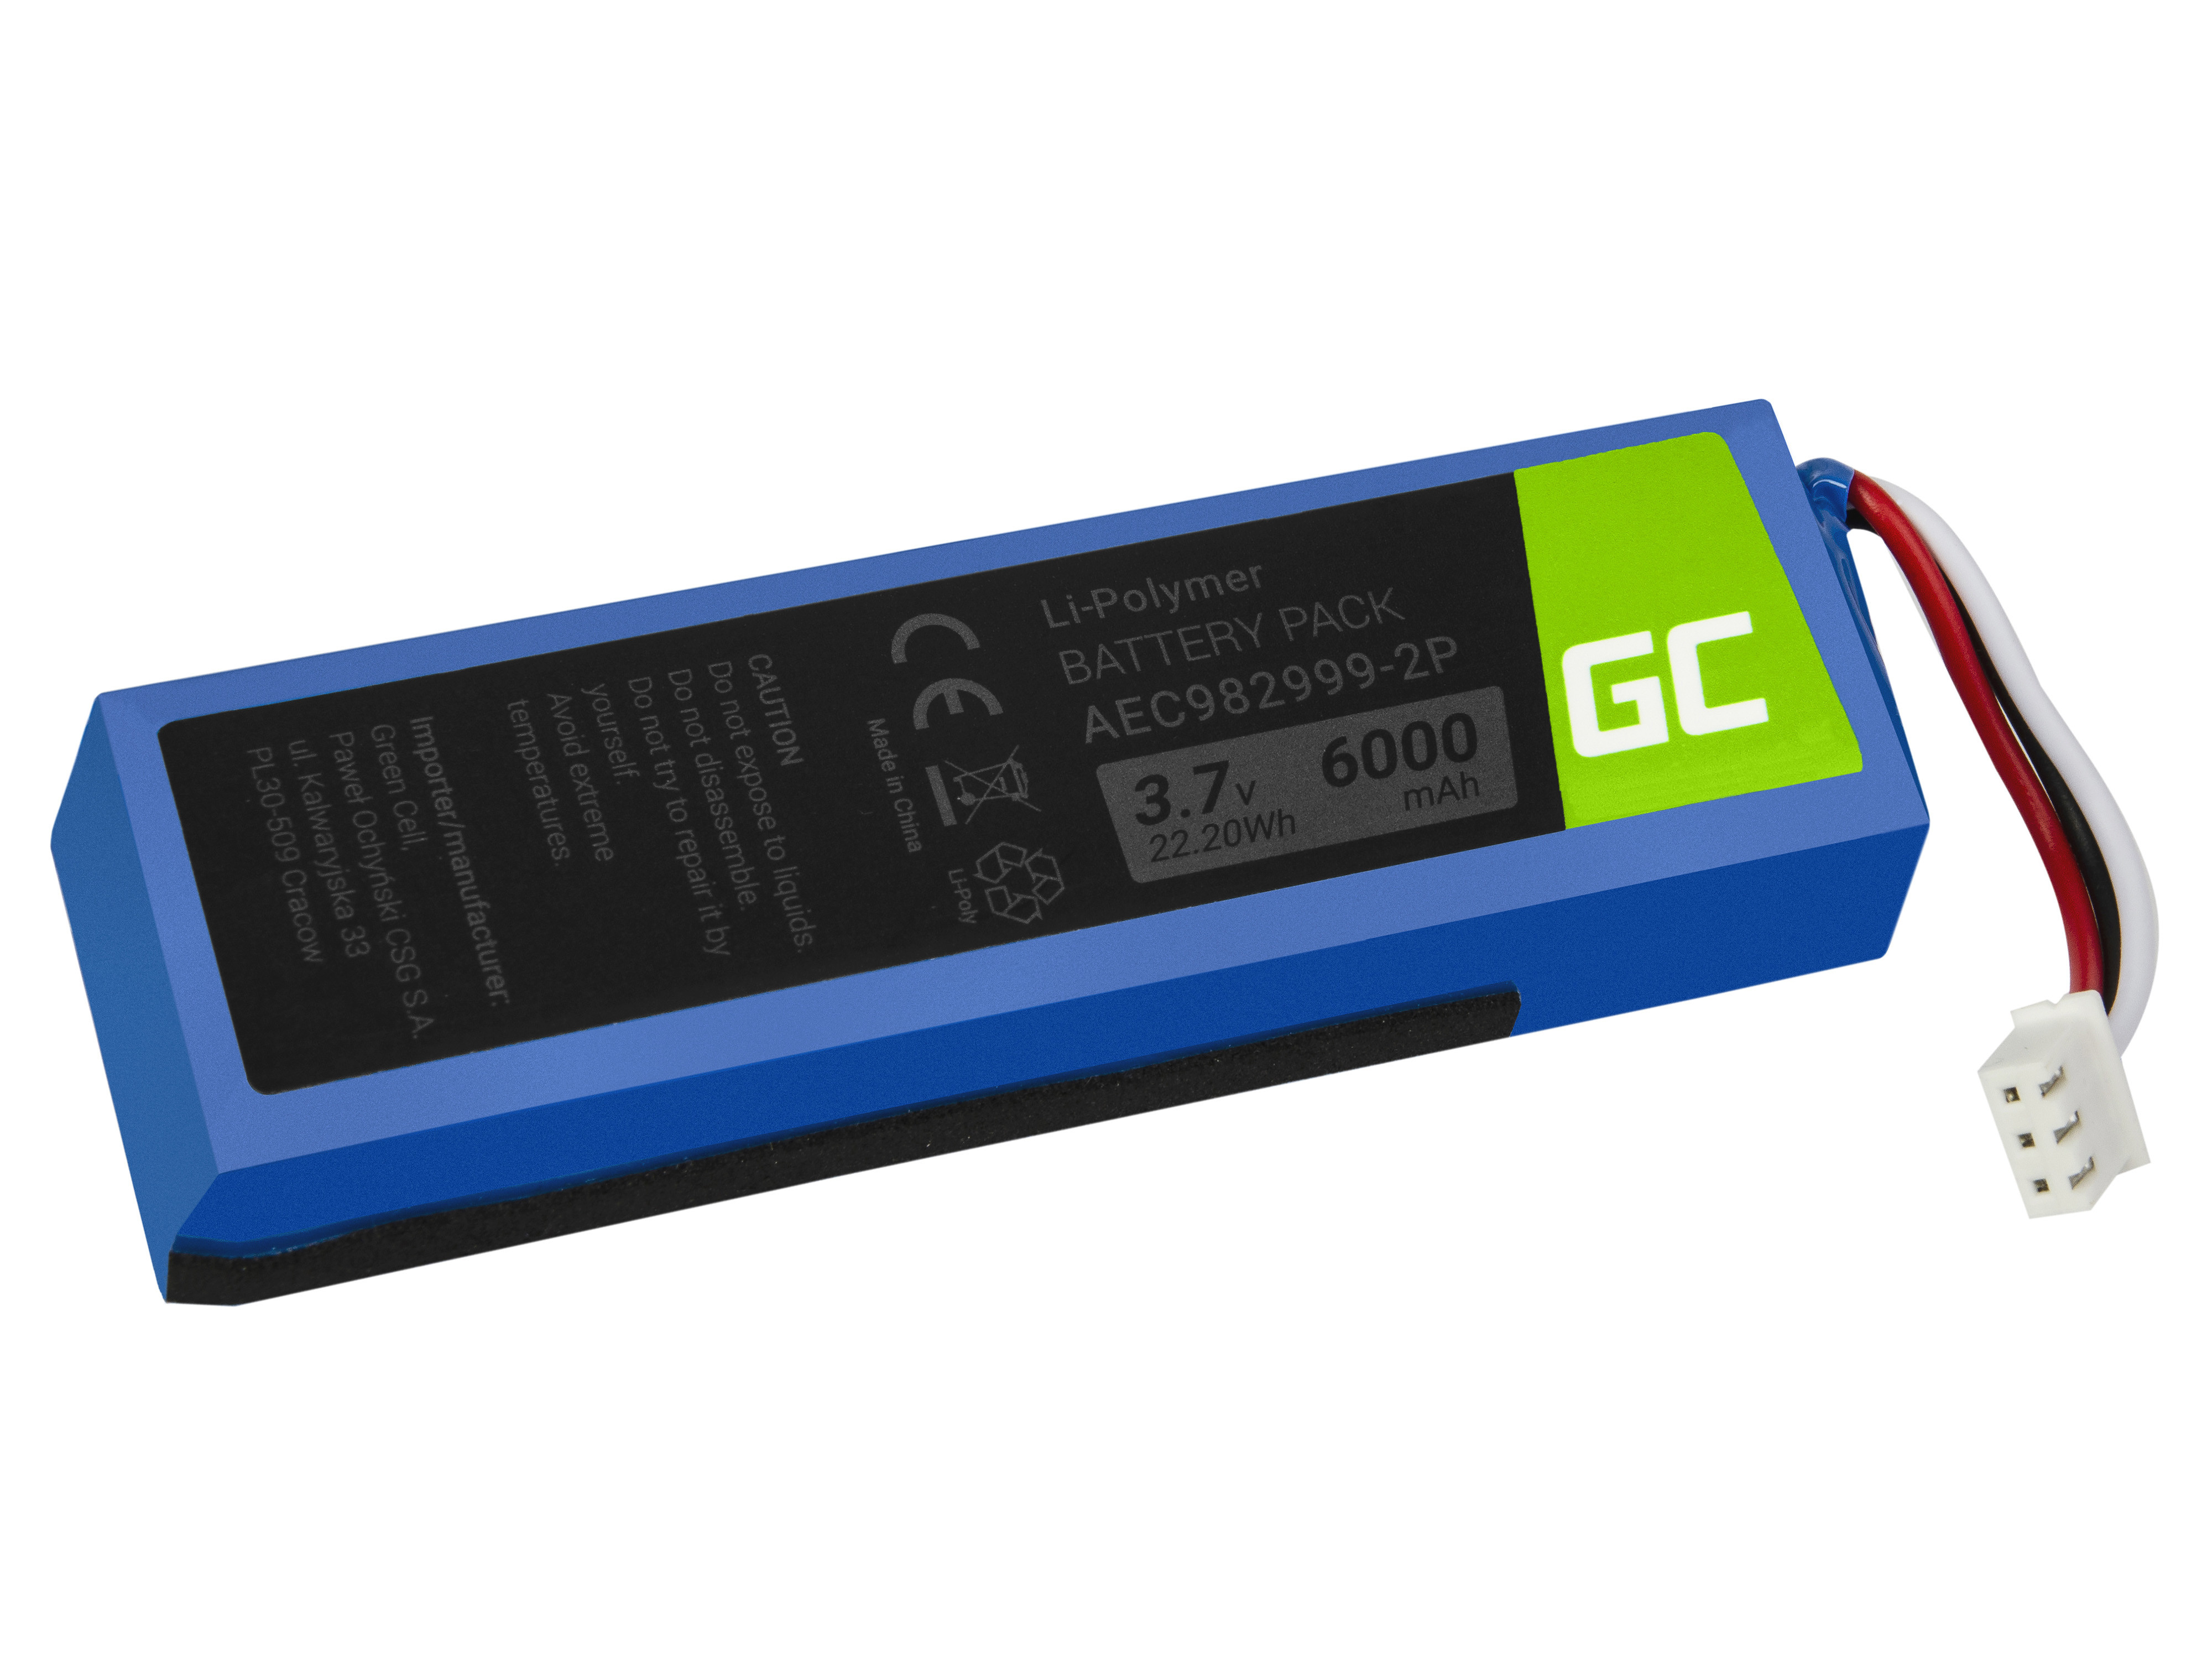 Green Cell AEC982999-2P Speaker Battery for JBL Charge